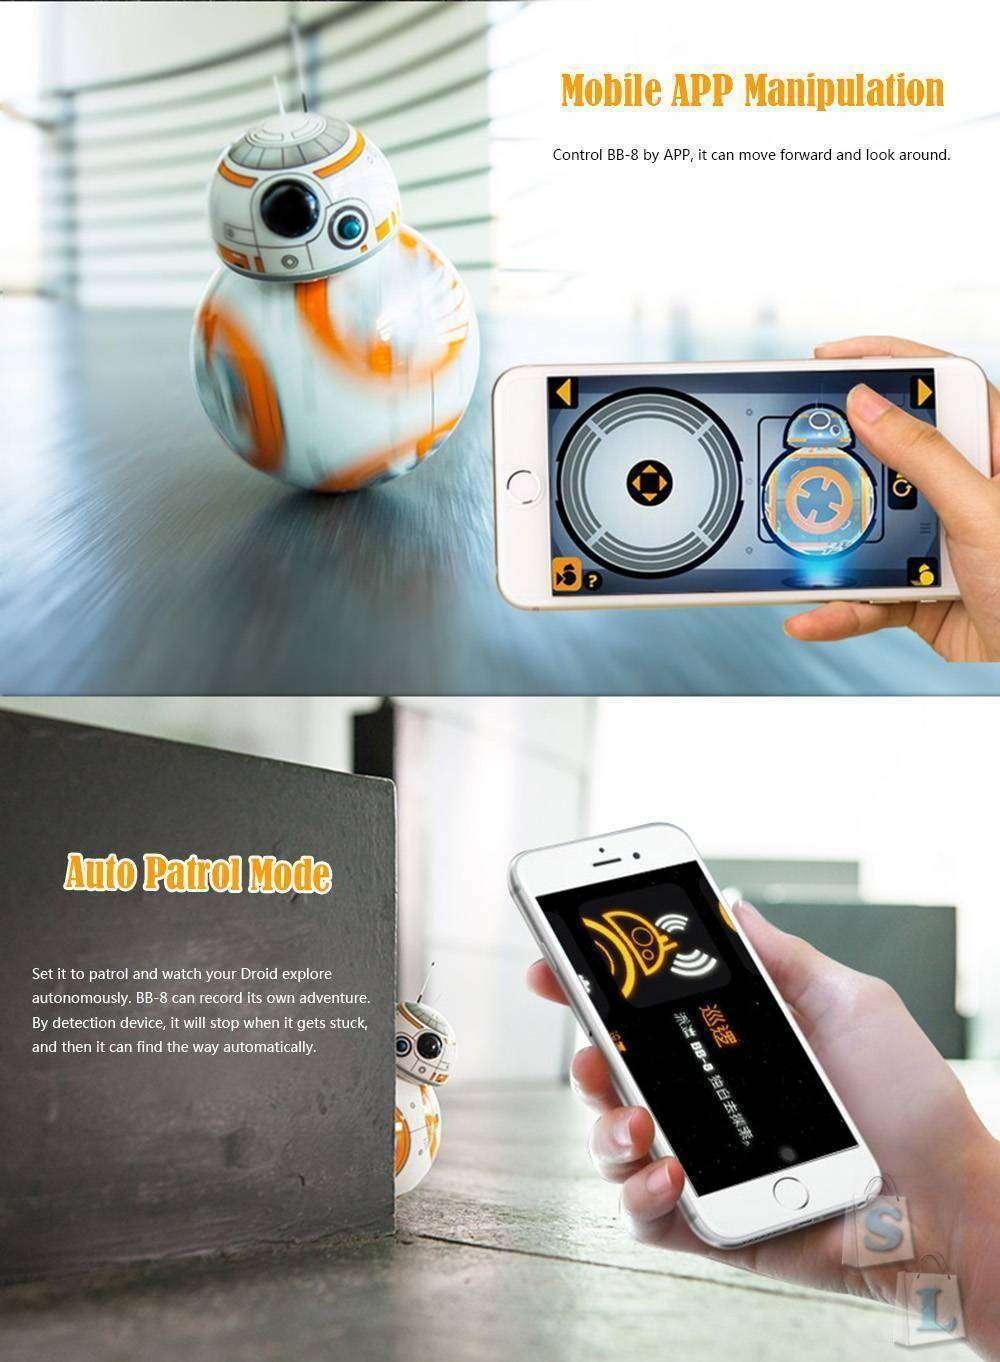 GearBest: Star Wars - Астродроид BB-8